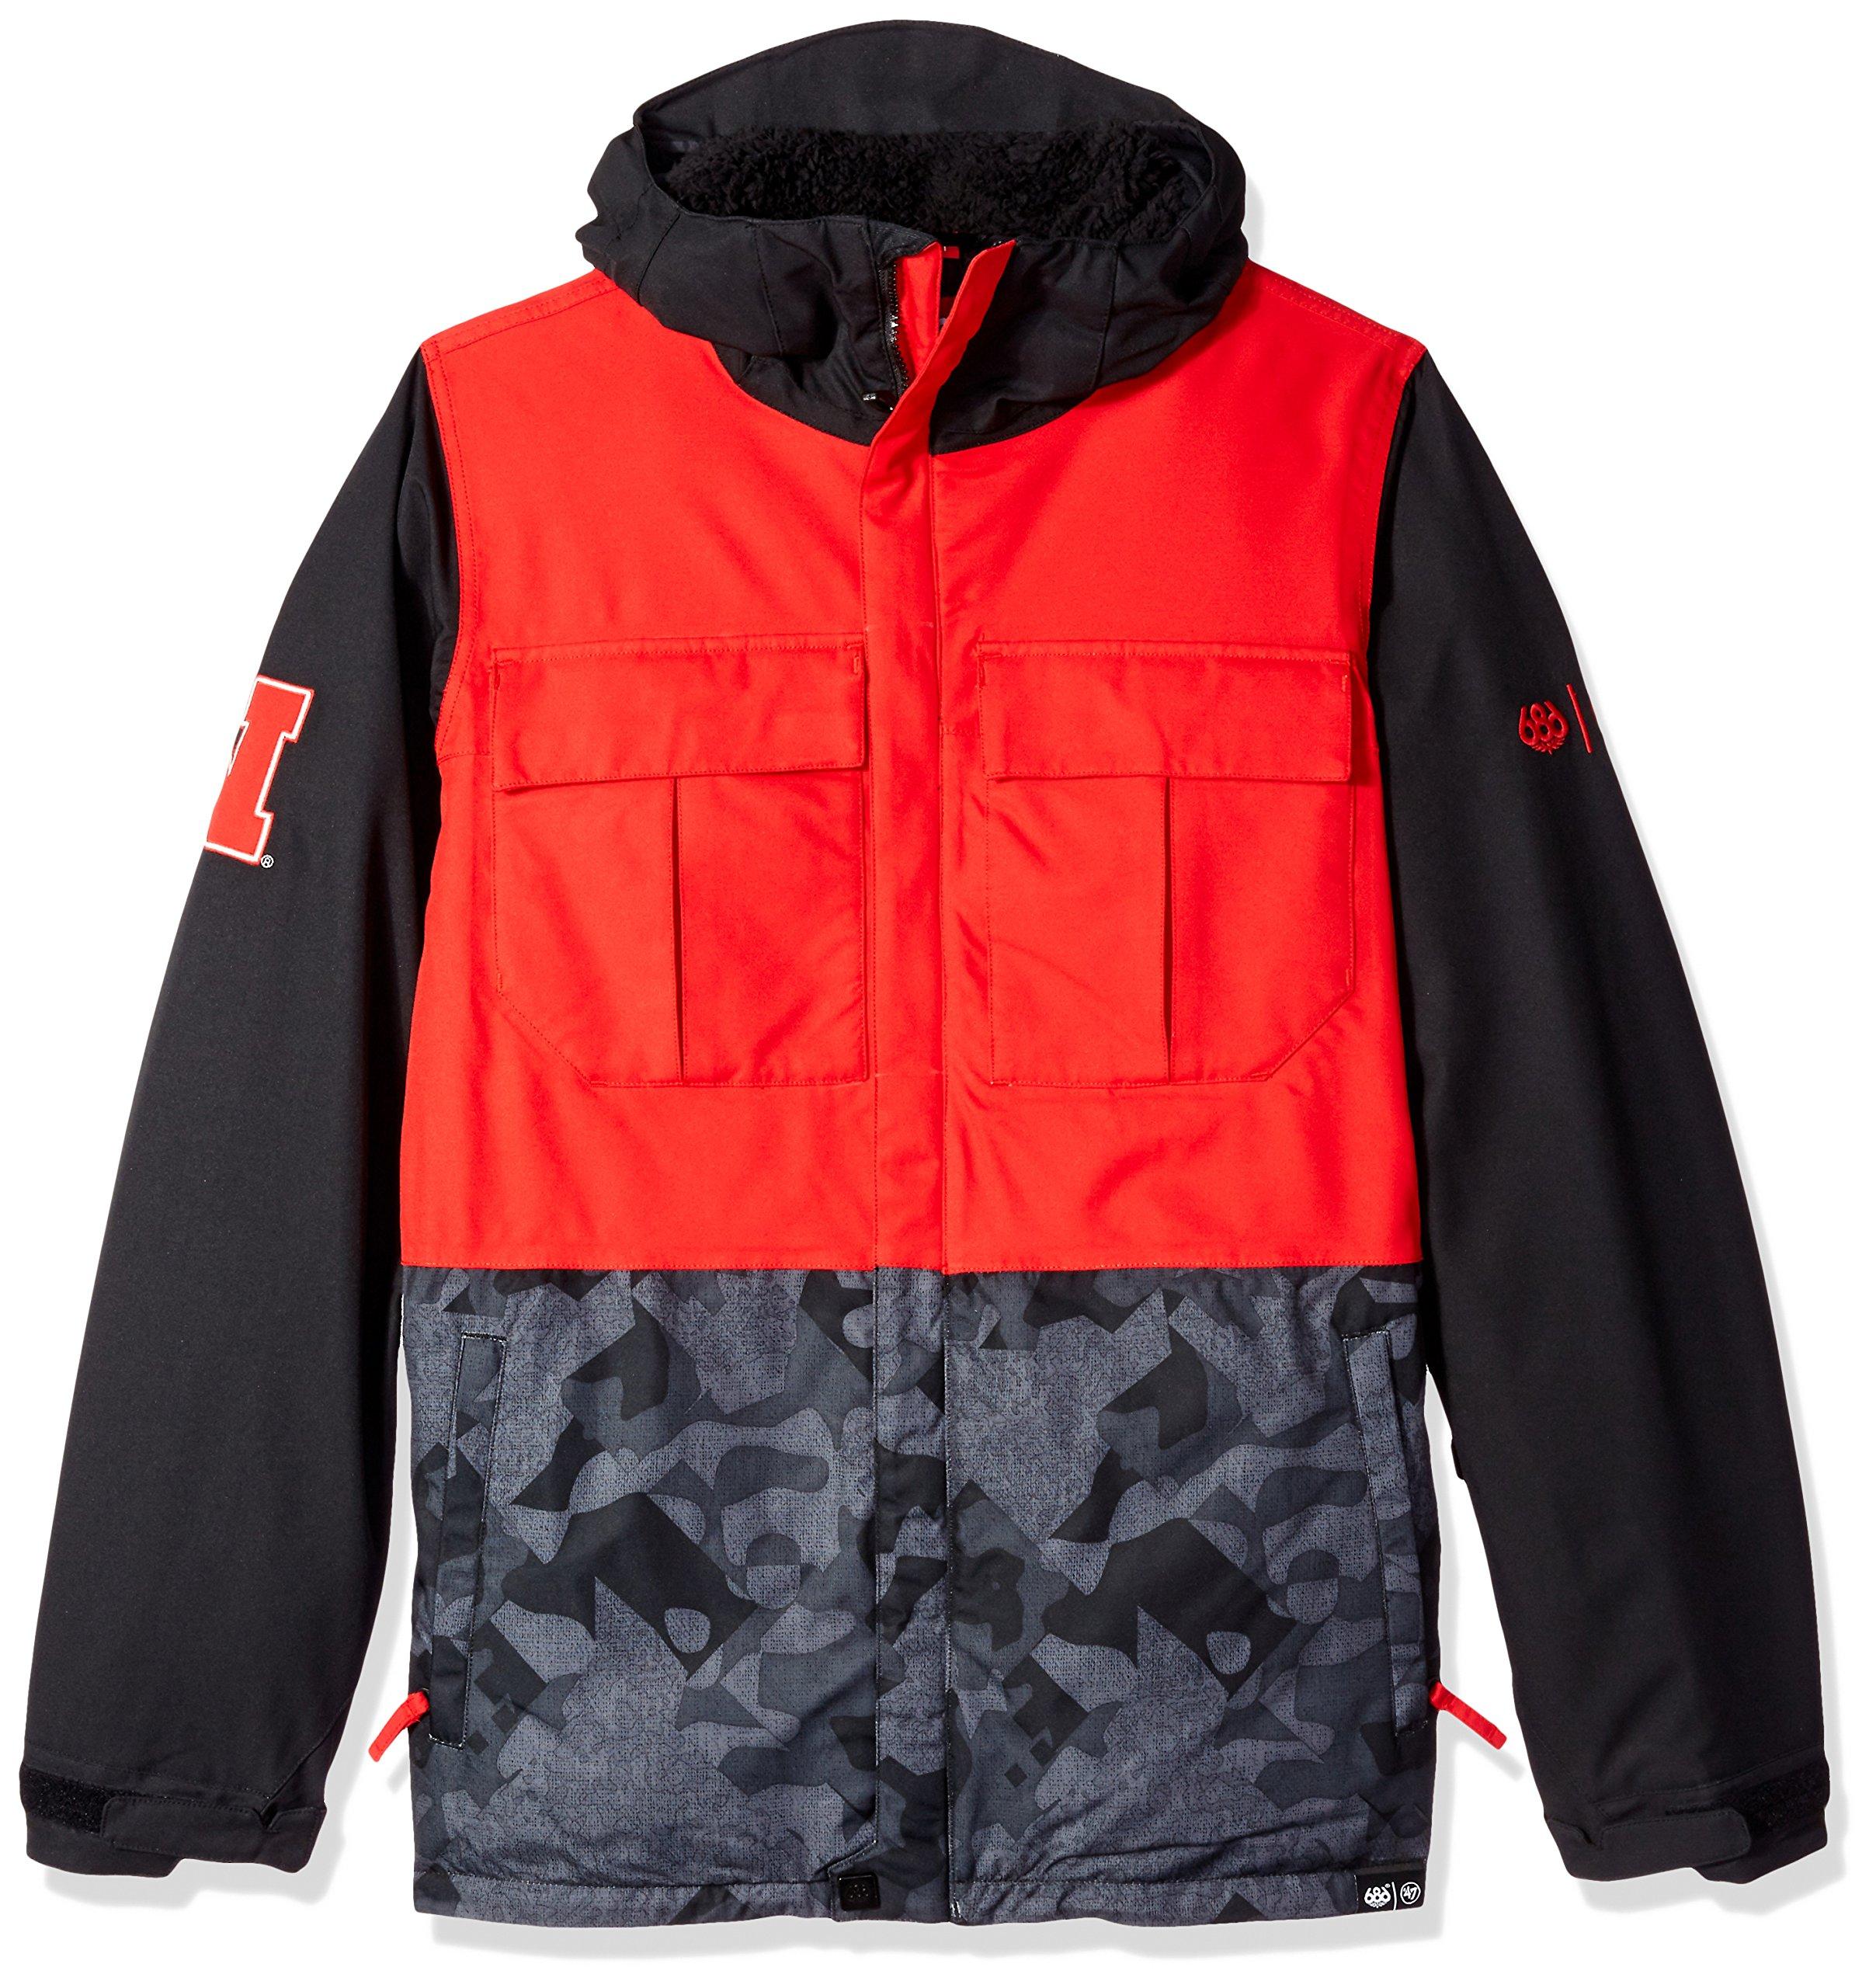 686x47 NCAA Nebraska Cornhuskers Men's Victory Insulated Jacket, Large, Nebraska Red